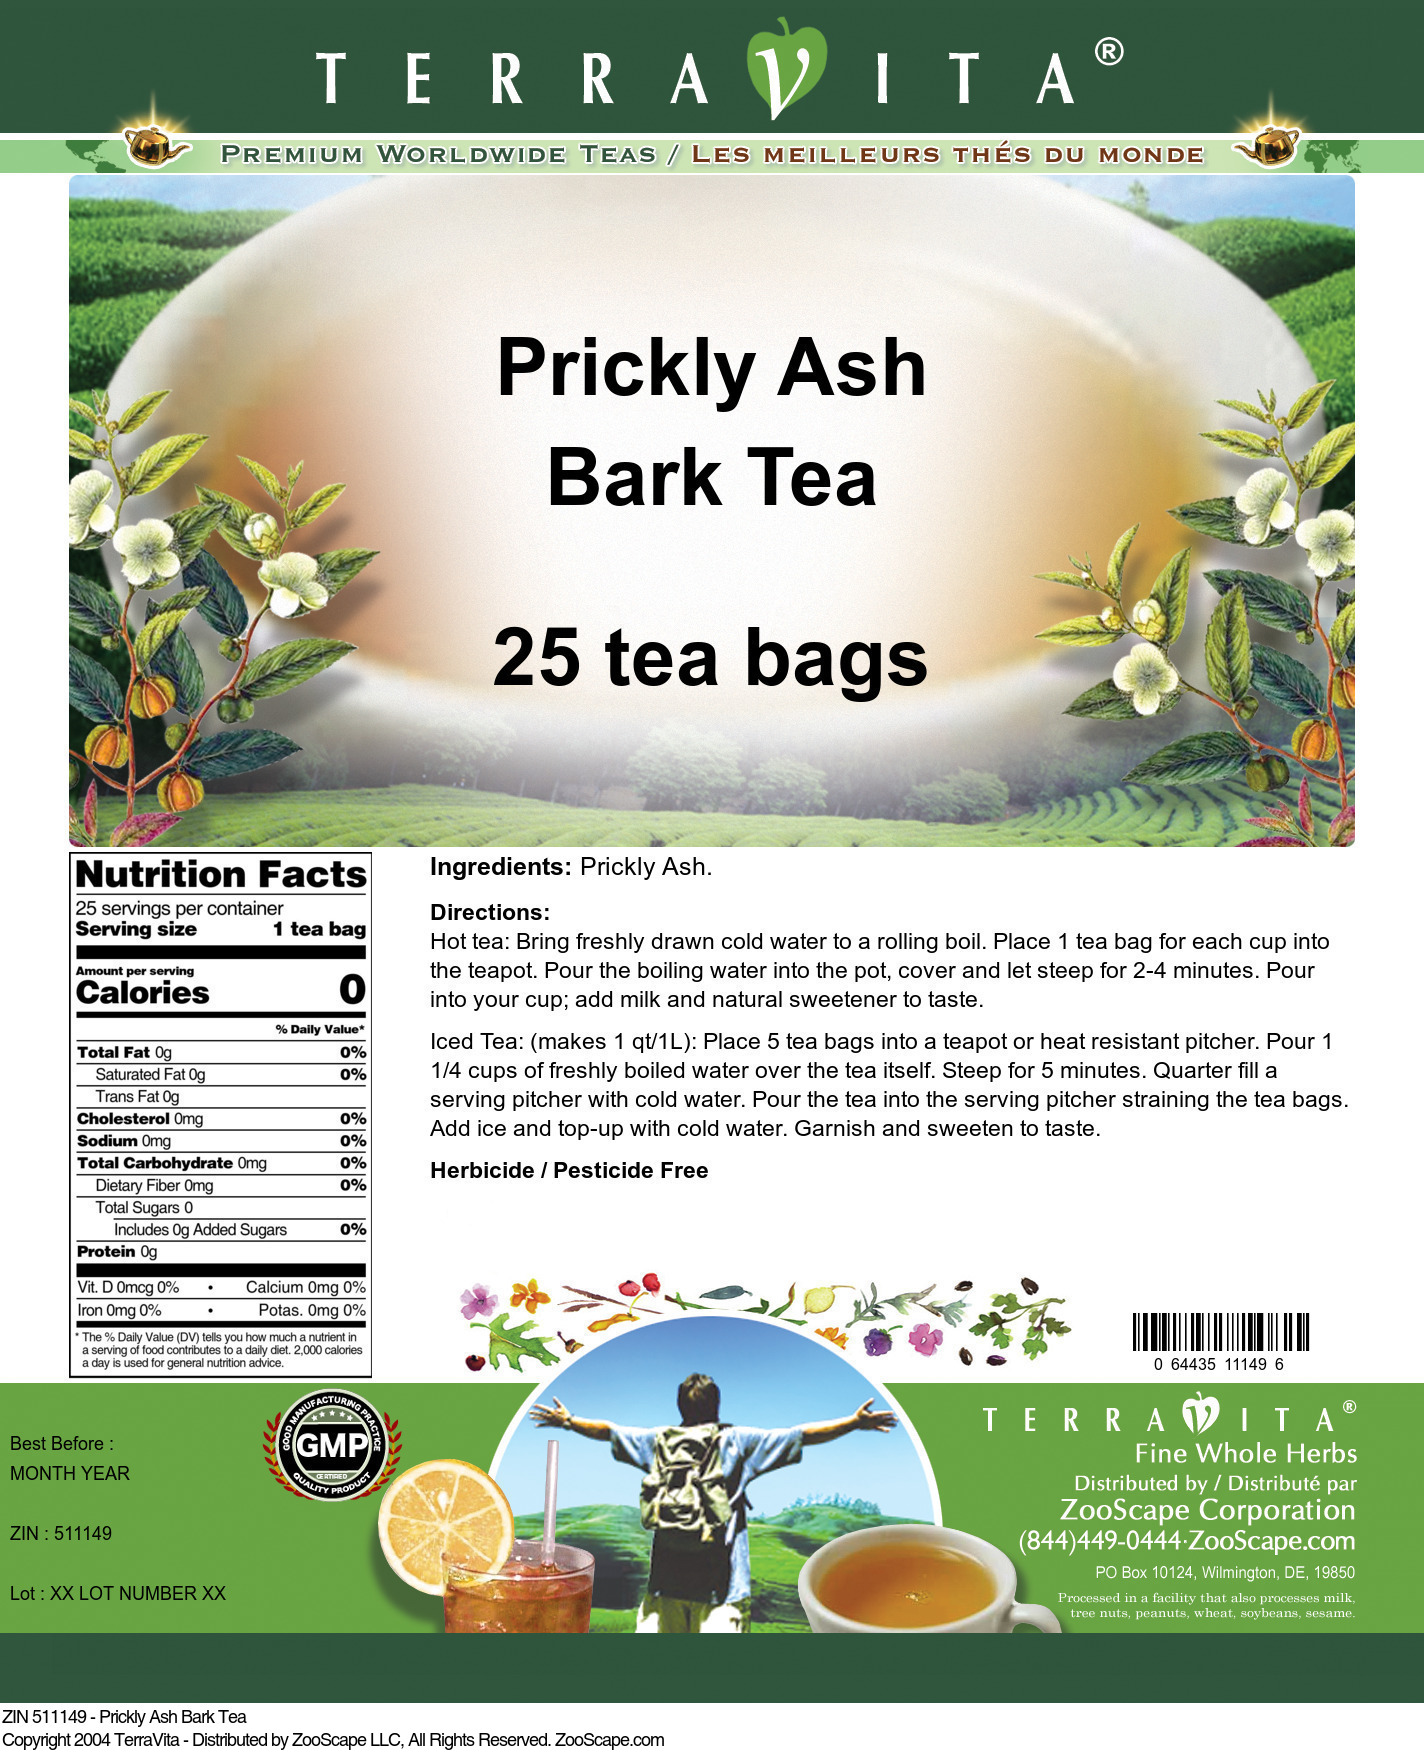 Prickly Ash Bark